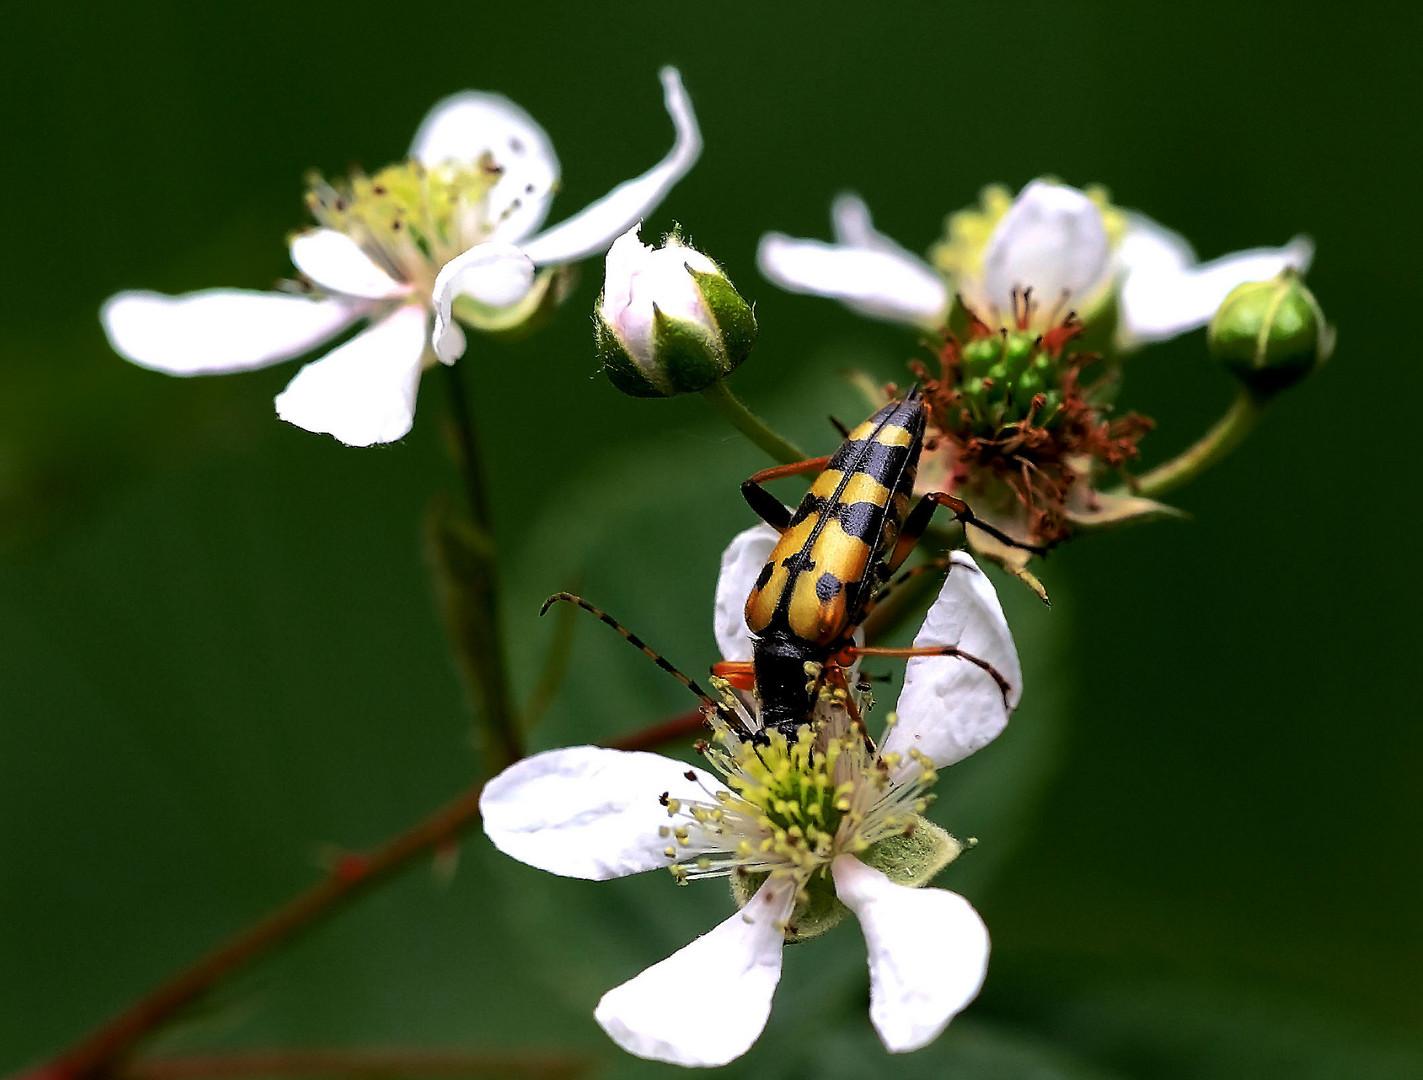 Gefleckter Schmalbock (Leptura Maculata)